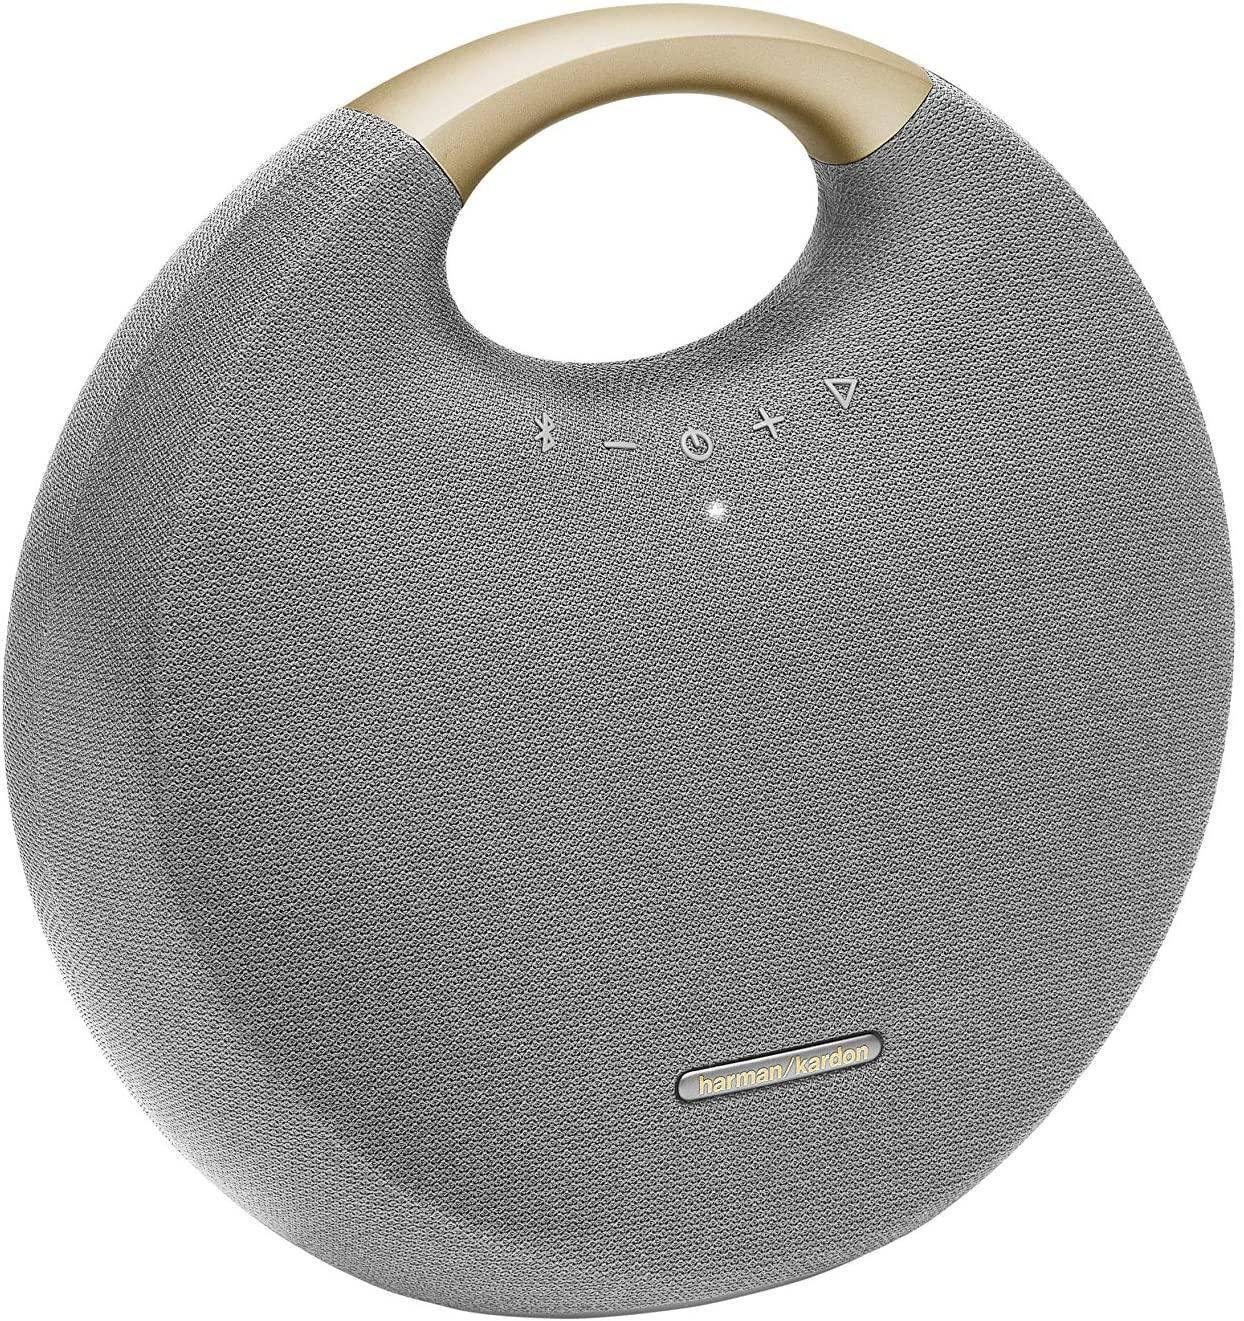 Harman Kardon Onyx Studio 6 Wireless Speaker zoom image